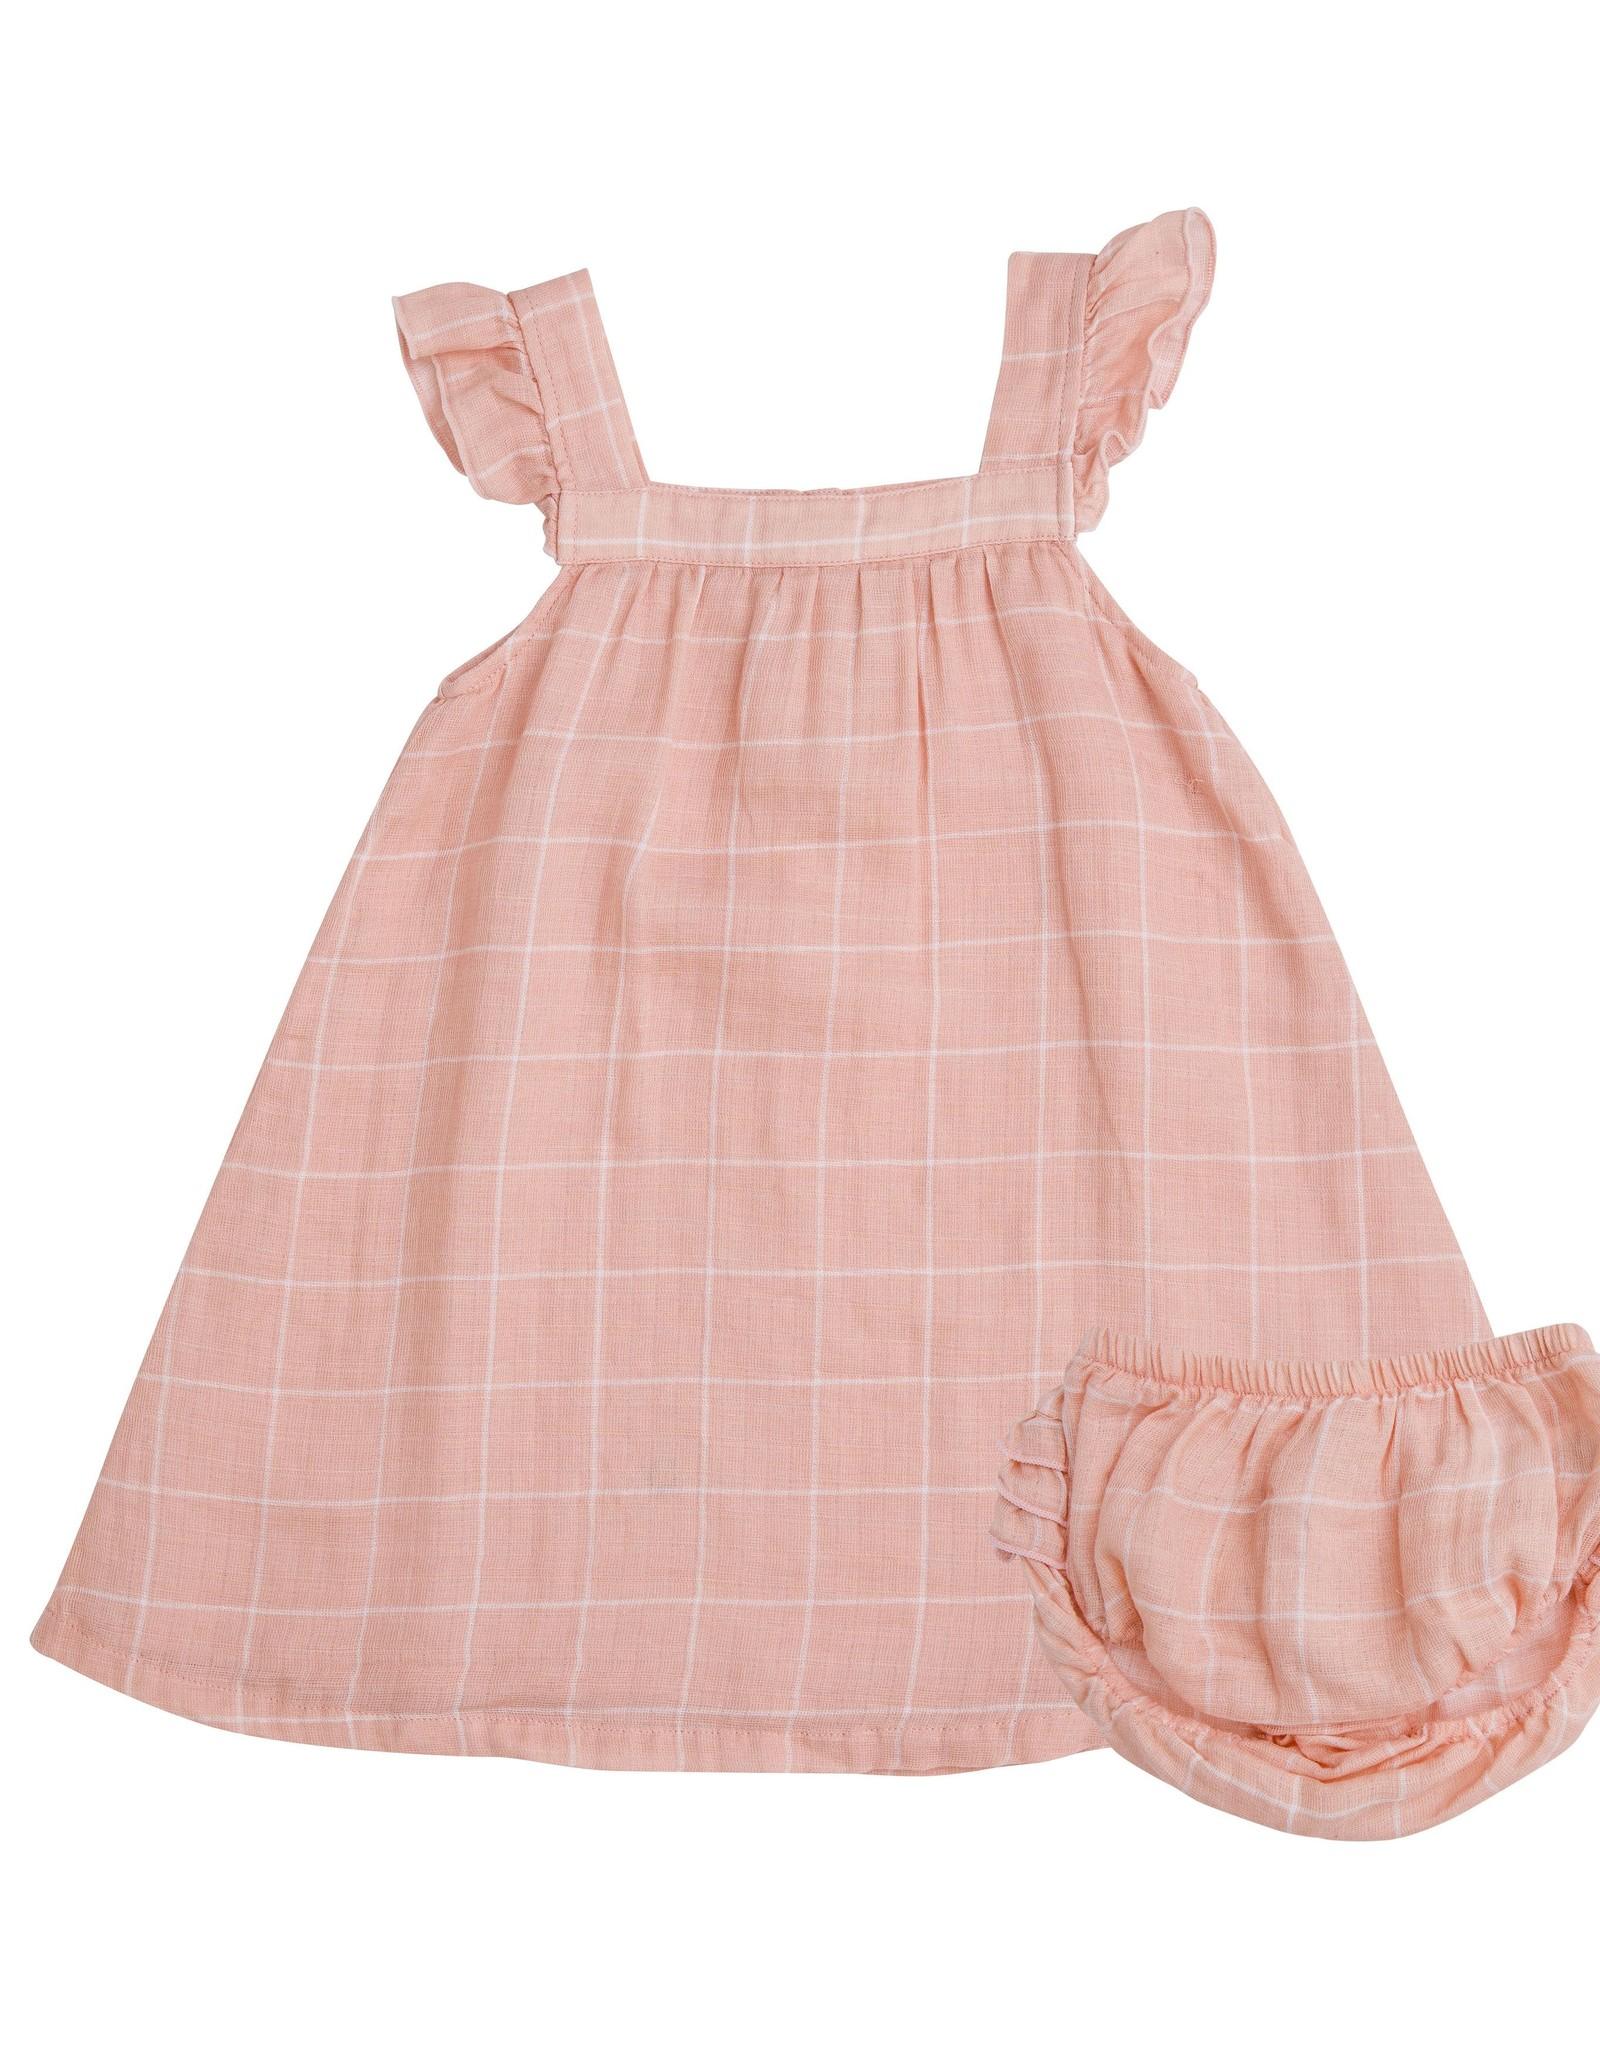 Angel Dear pink grid sundress